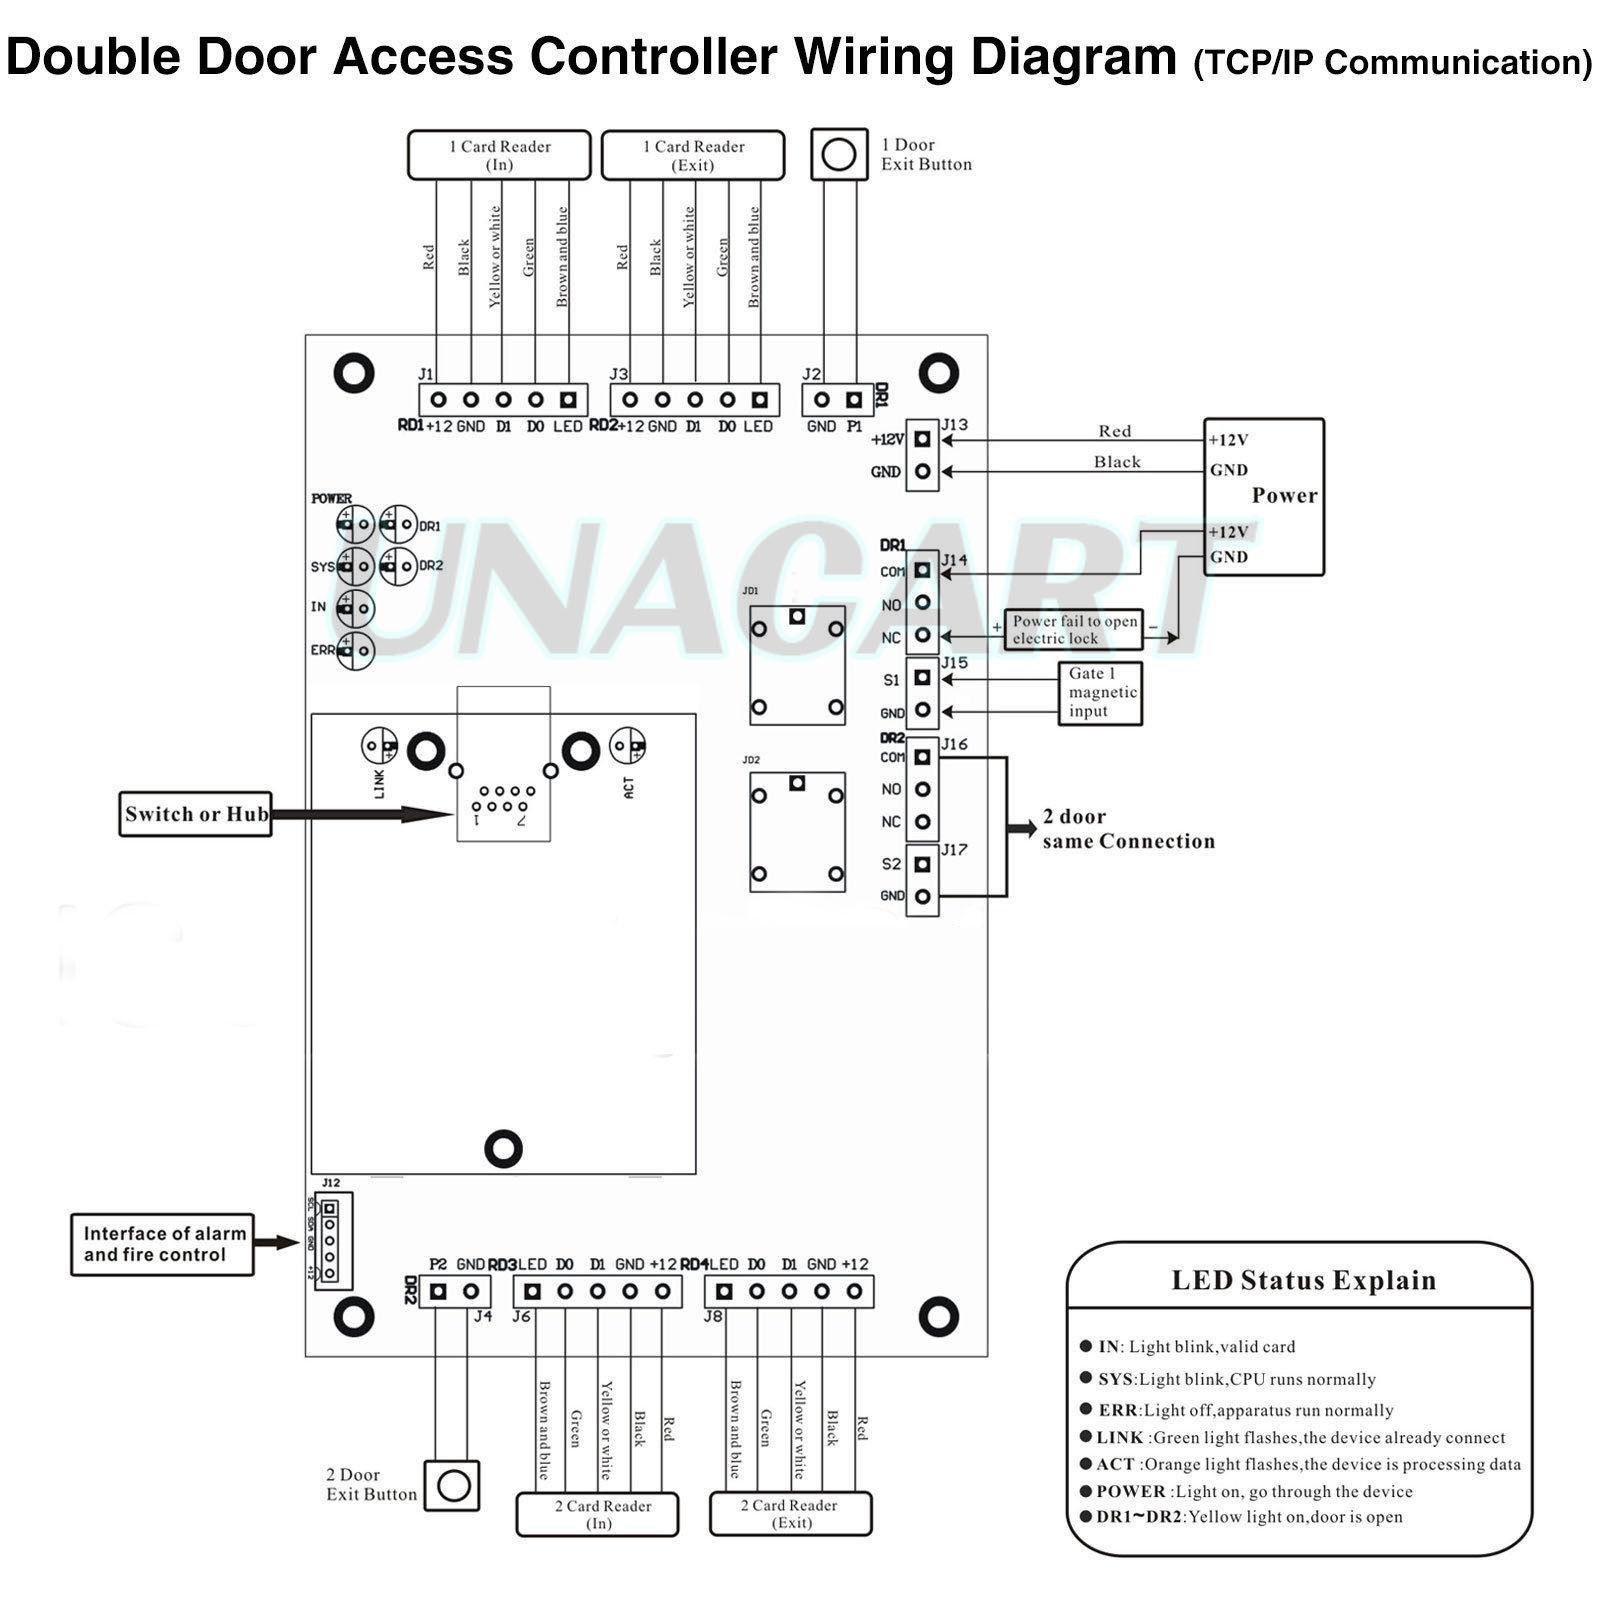 Hid Diagram Rp 40 Schematics Data Wiring Diagrams Fmx Transmission Xs650 Chopper Harness 1973 Tci Transmissions Api Rp40